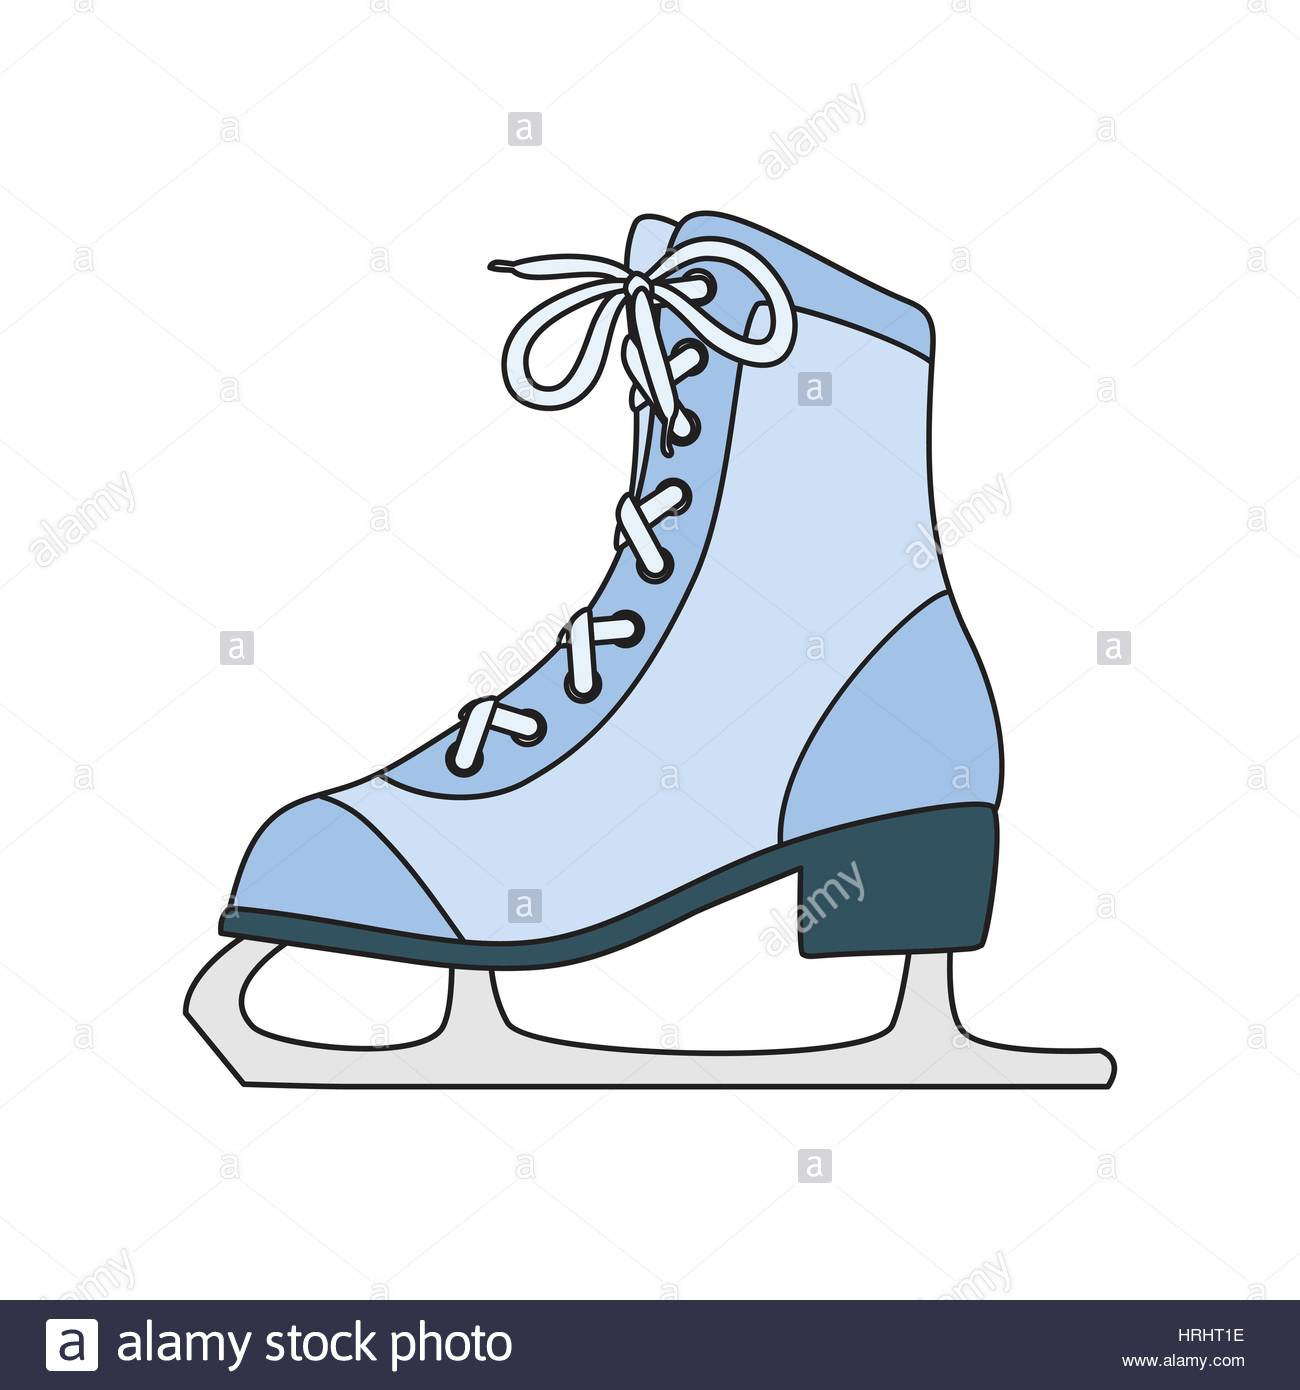 1300x1390 Ice Skates Line Art Drawing On White Background Stock Vector Art